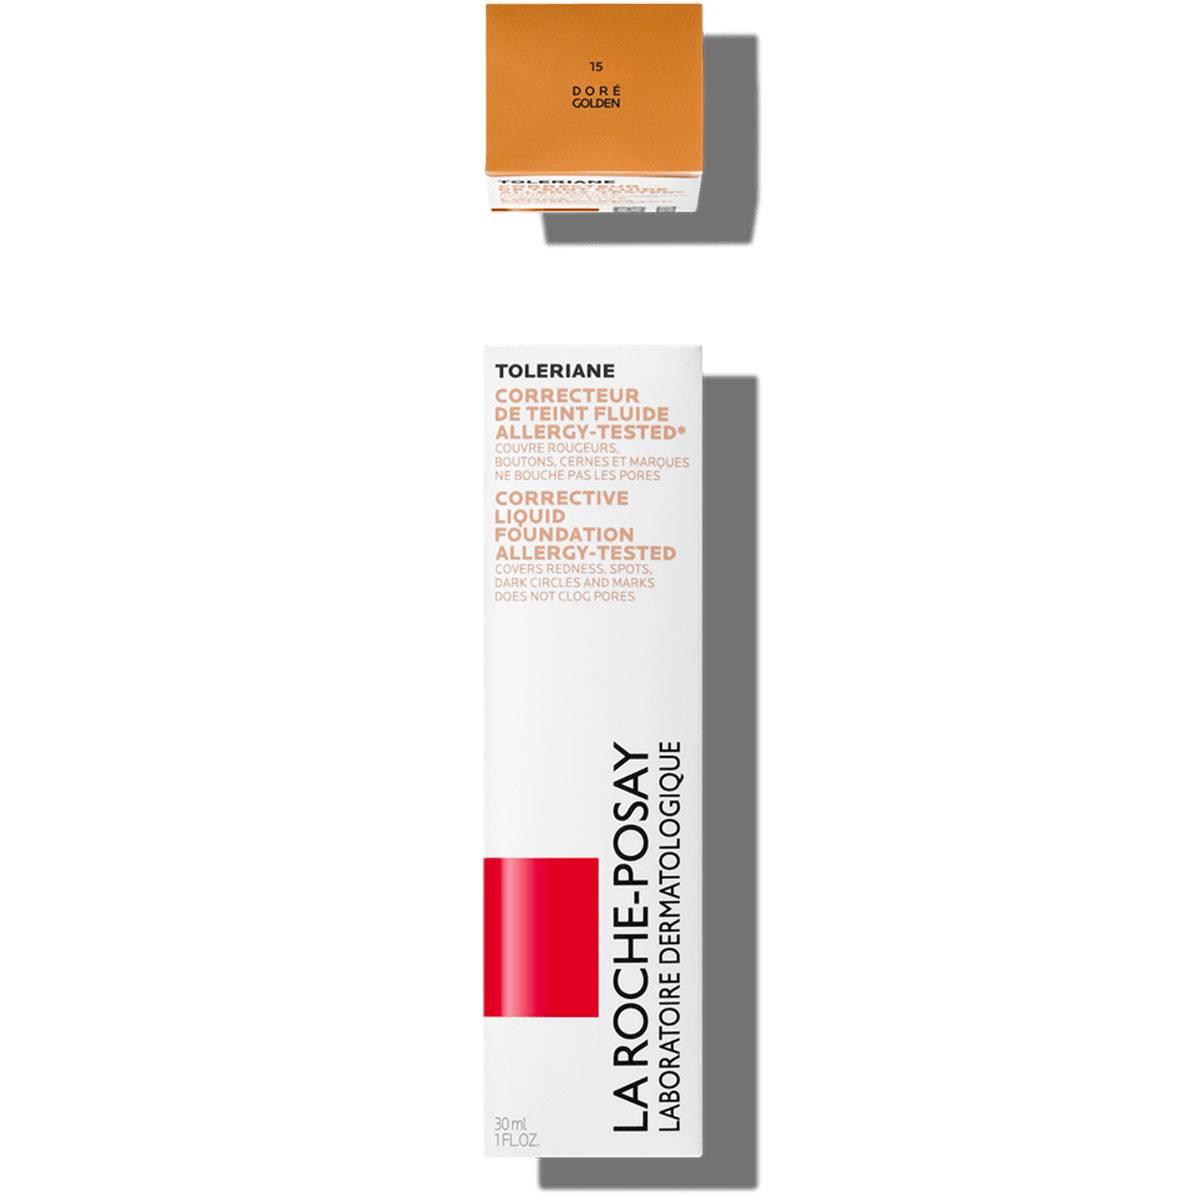 La Roche Posay Känslig Toleriane Make up CORRECTIVE LIQUID